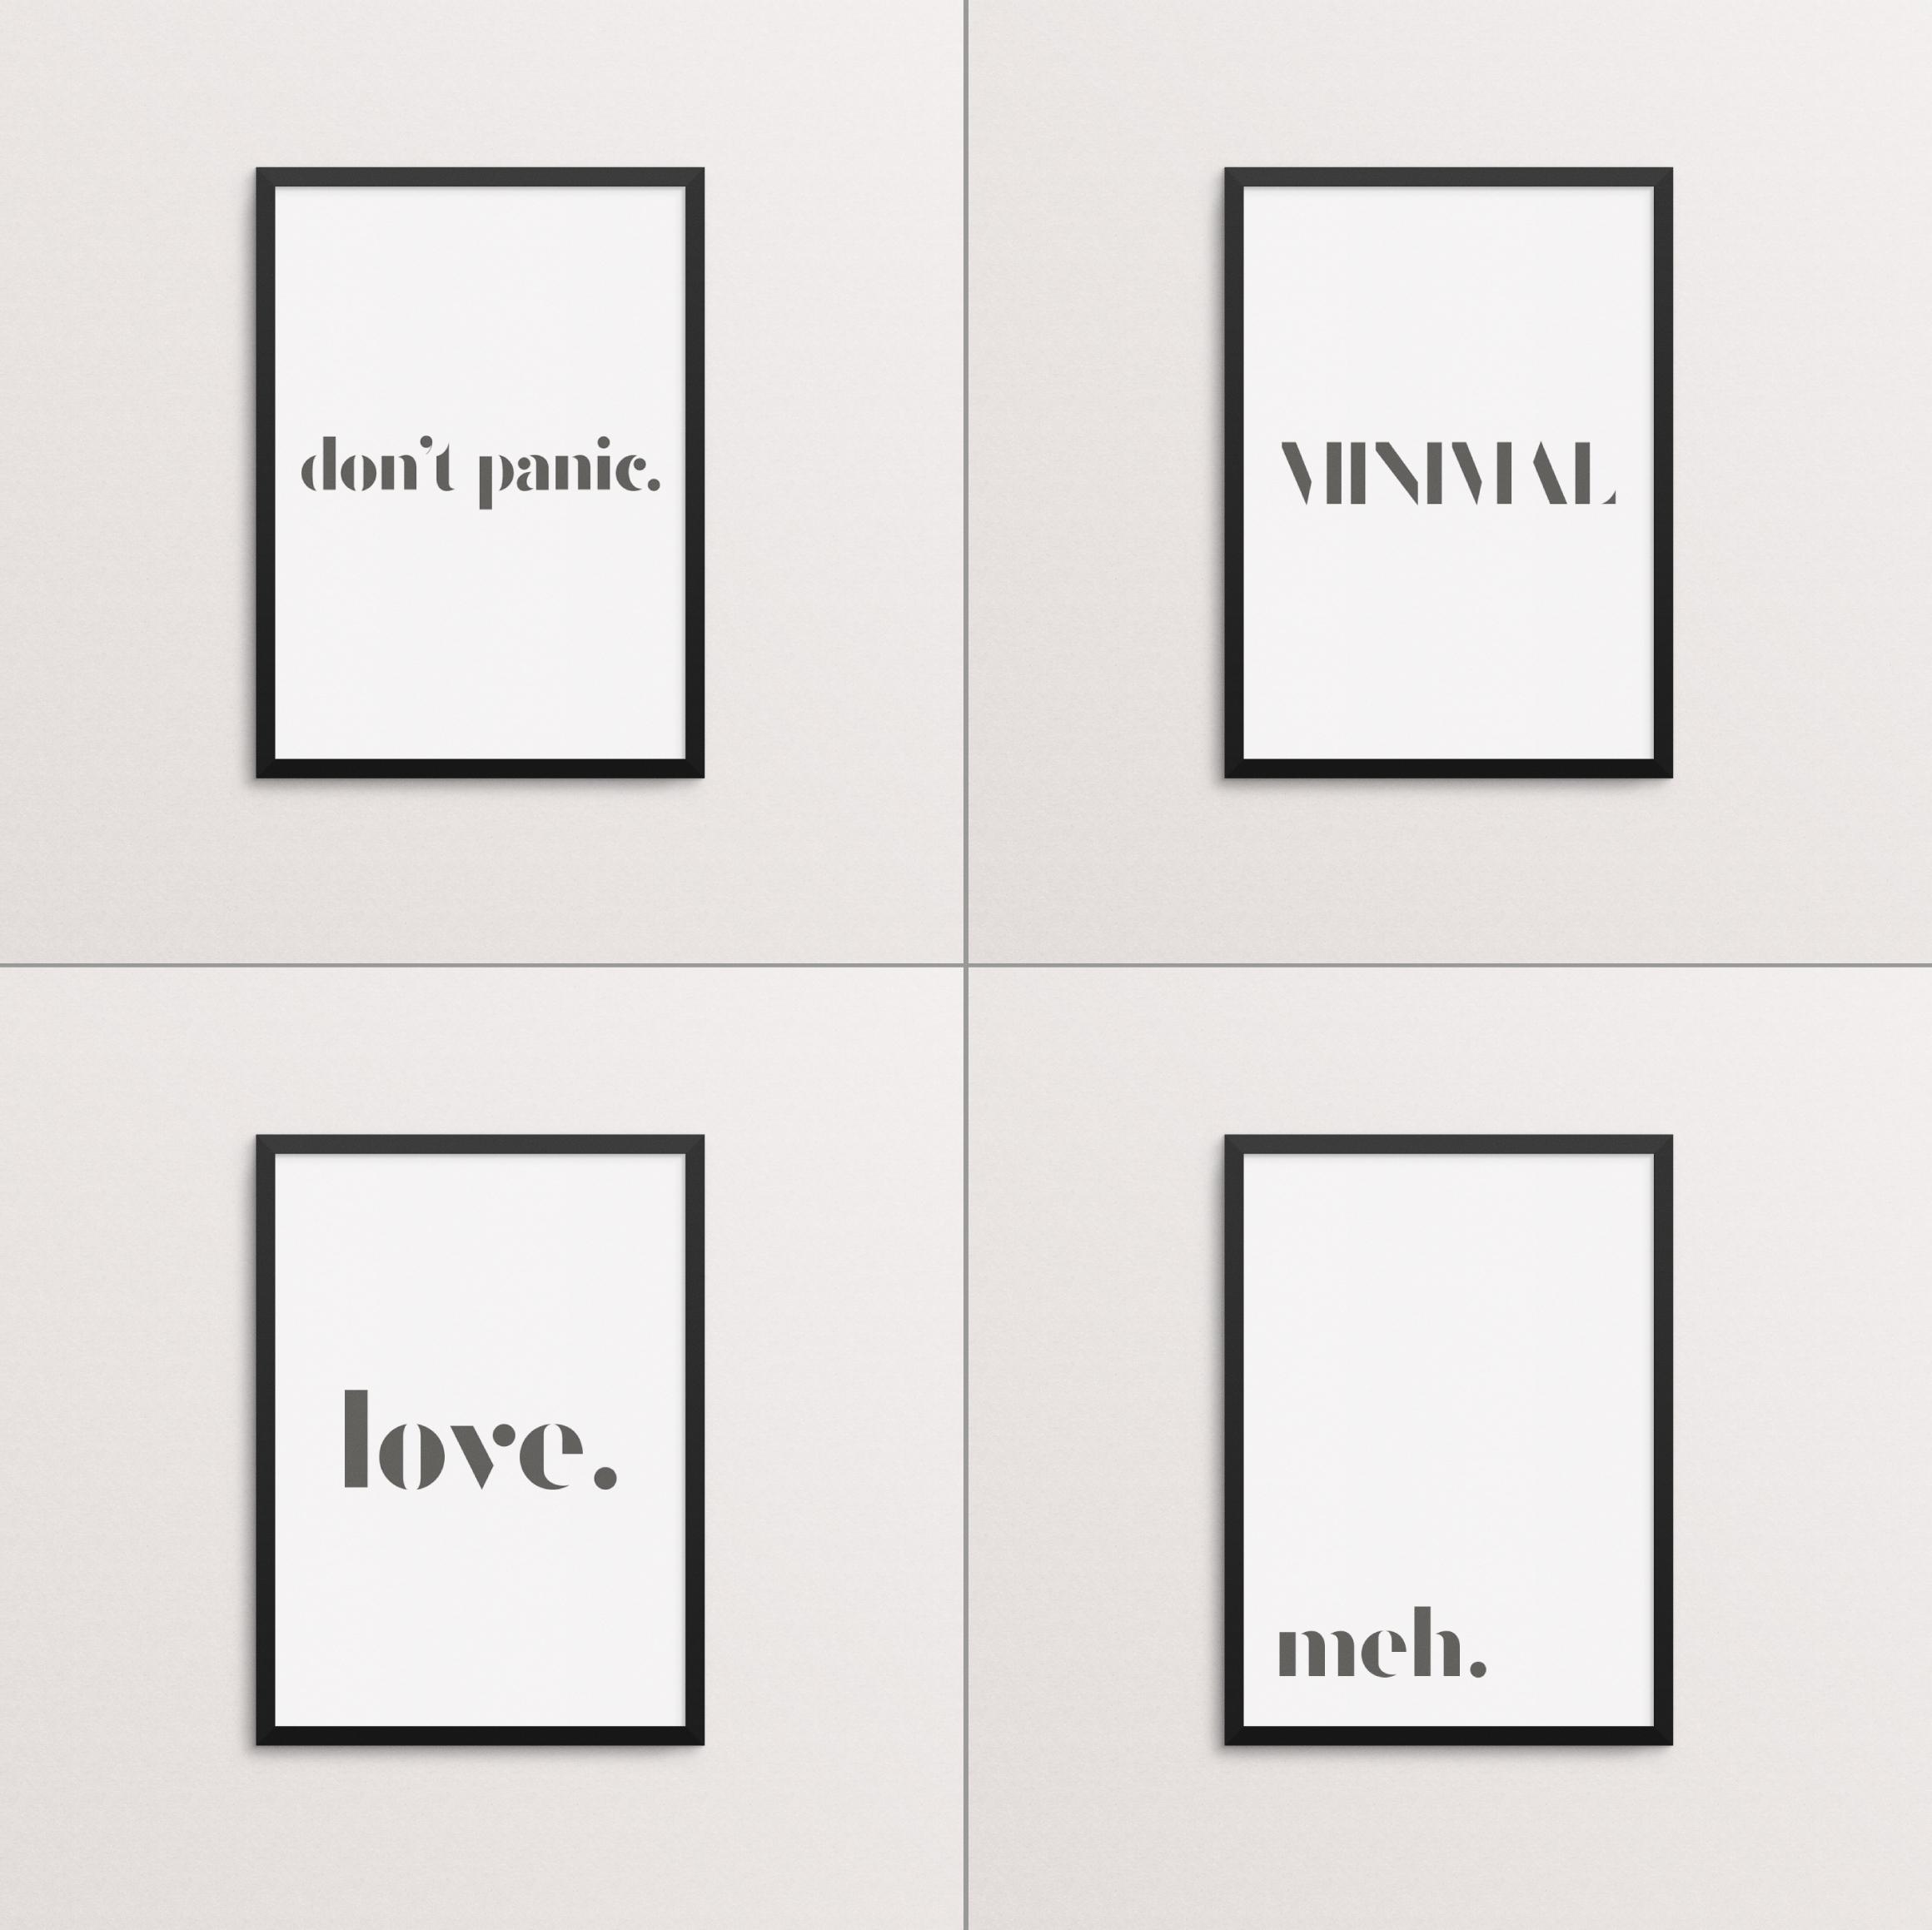 Catalogue - A Minimal Typeface example image 5